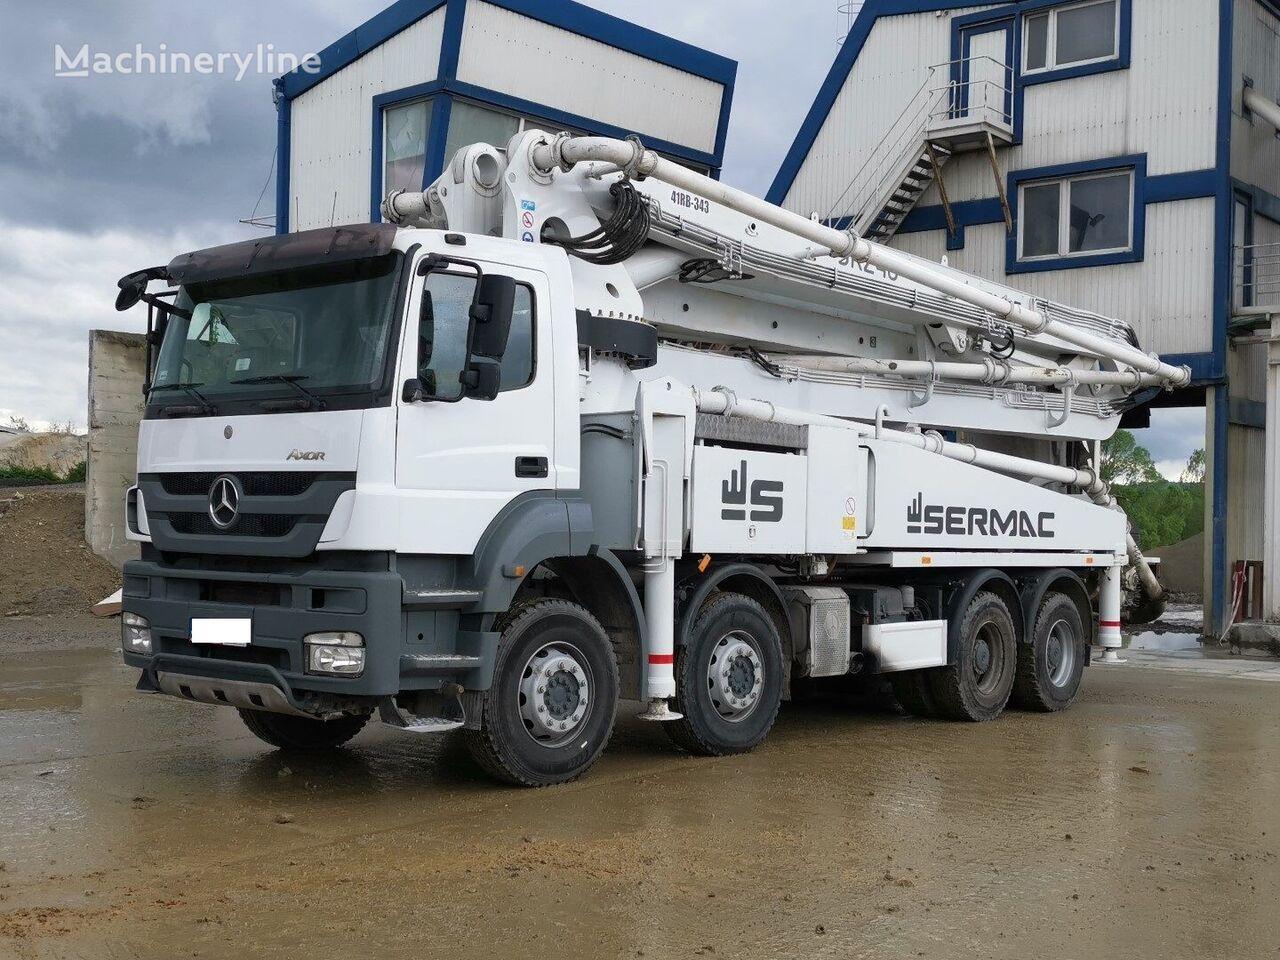 MERCEDES-BENZ 4140 8x4 Euro 5, 2016year Sermac 46m Concrete pump, 5RZ46, 150m3 betona sūknis